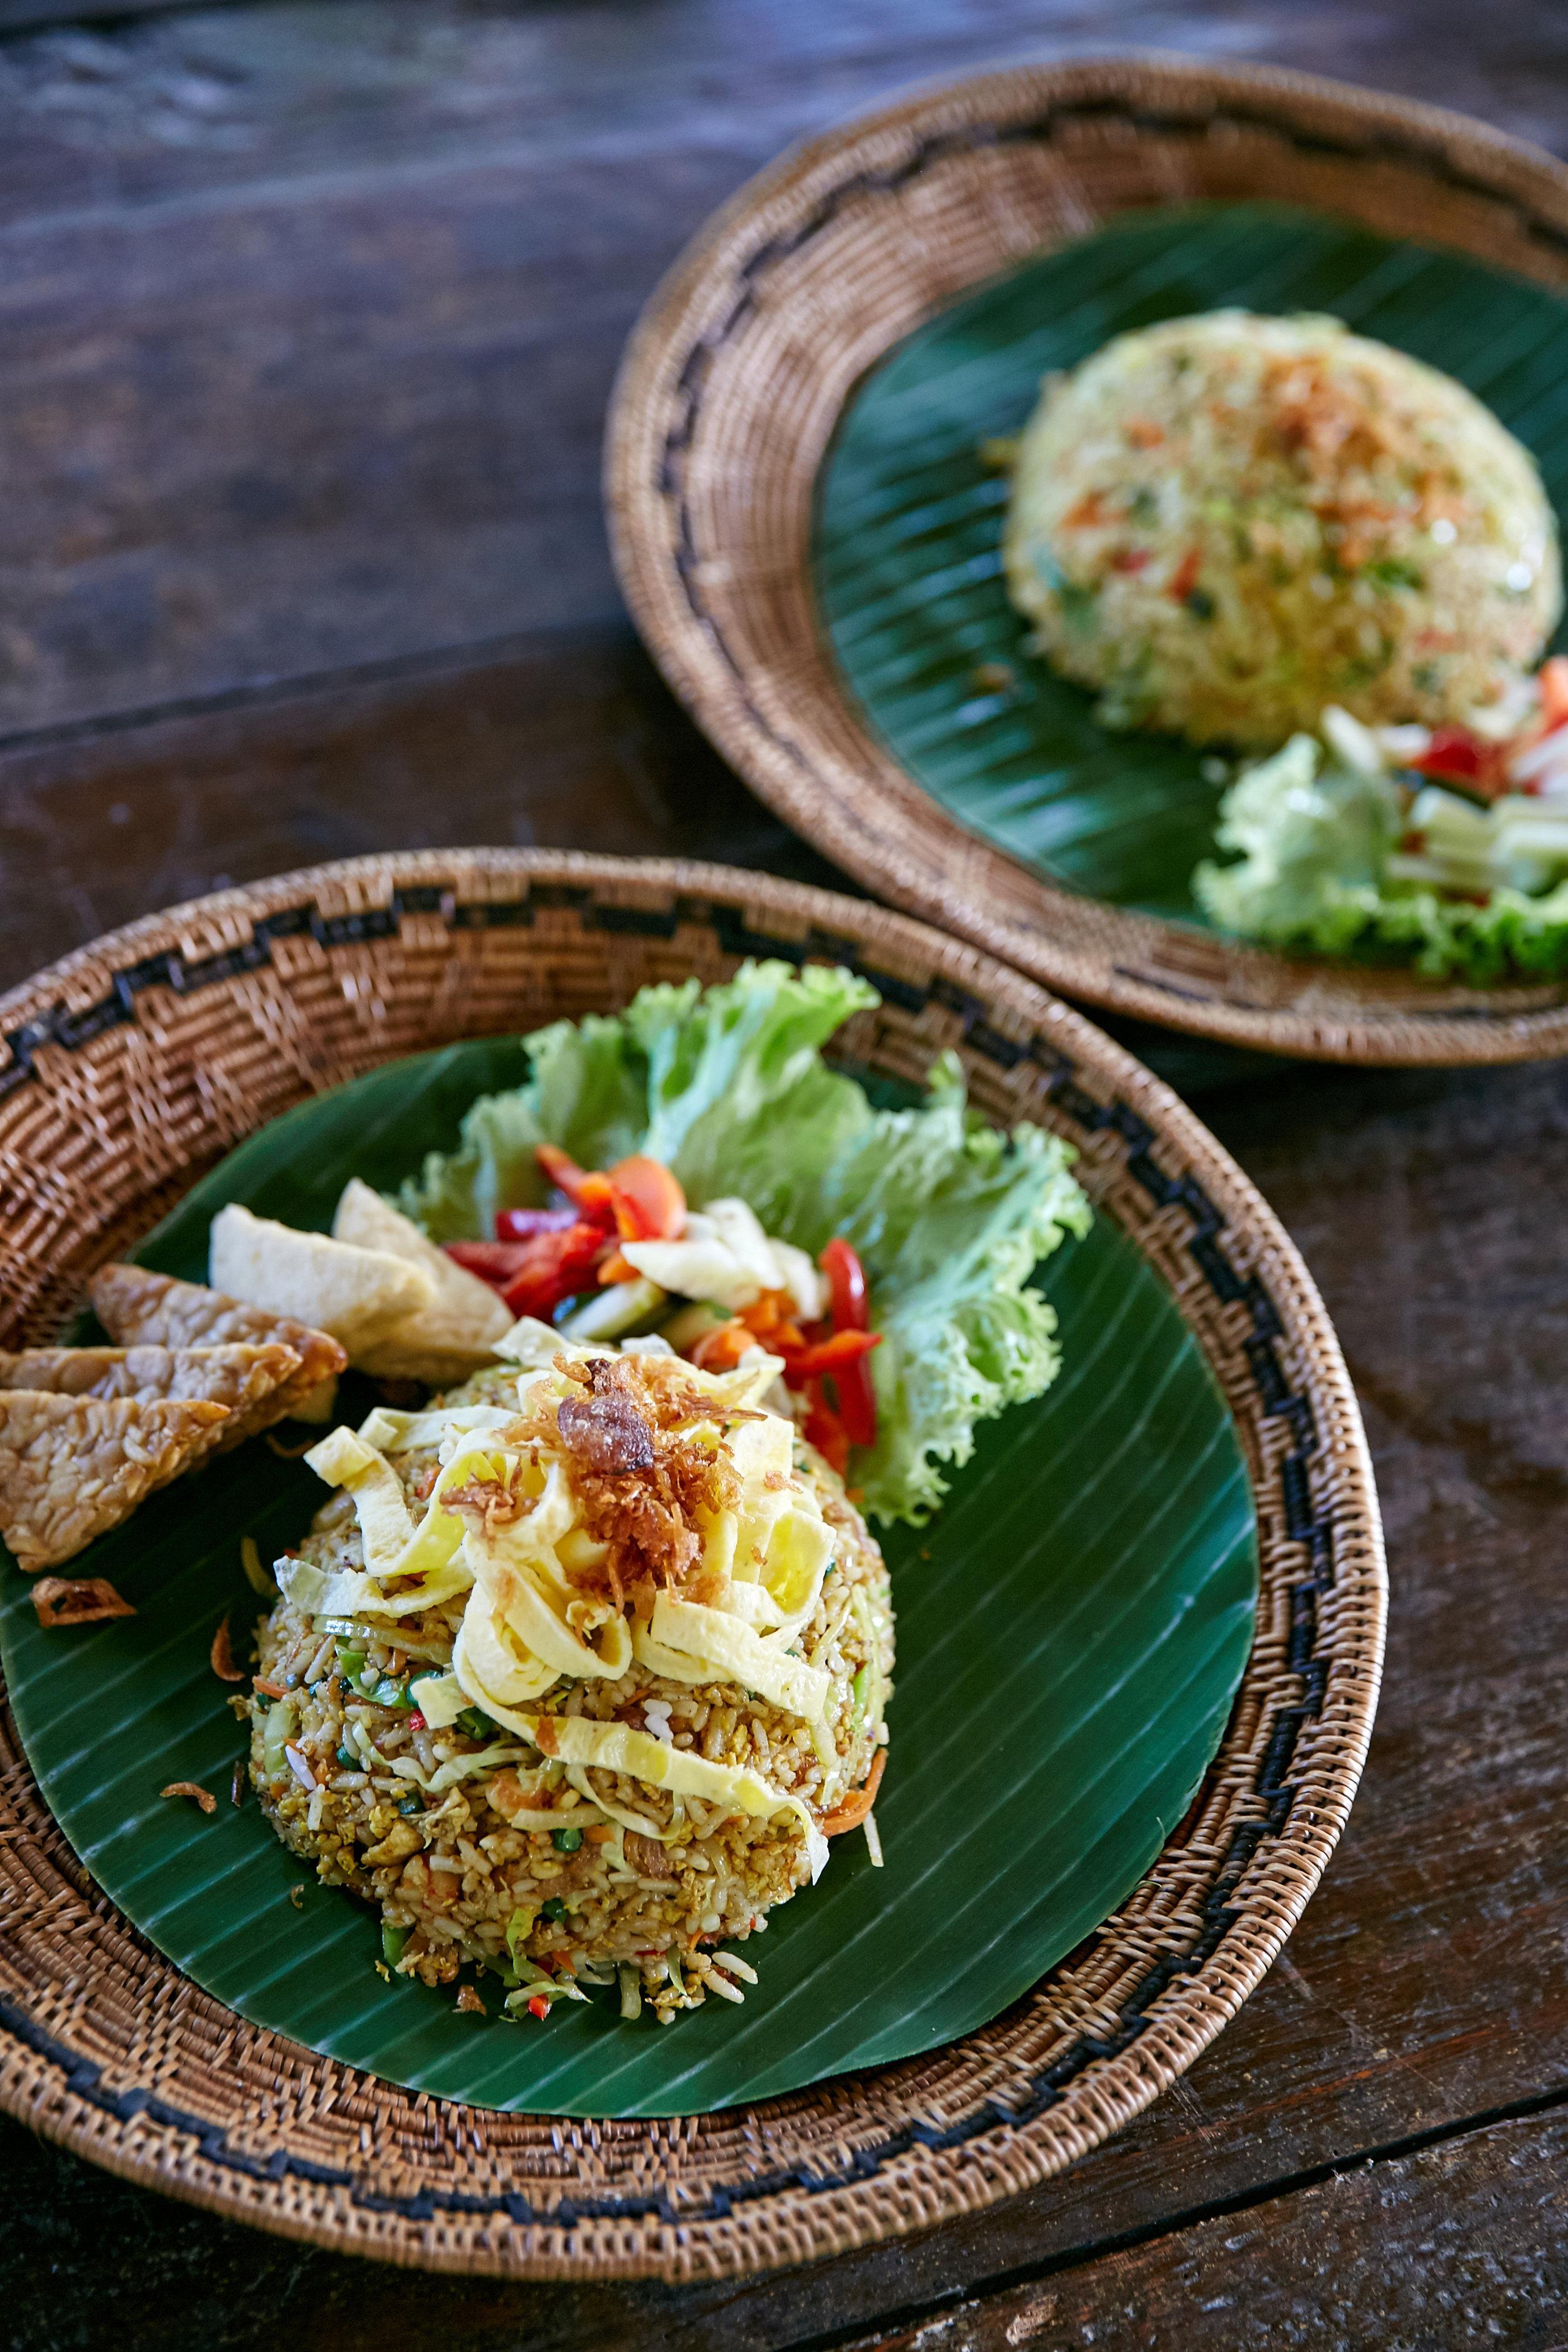 Alila Manggis - Alila Experiences - Culinary Delight 16.jpg